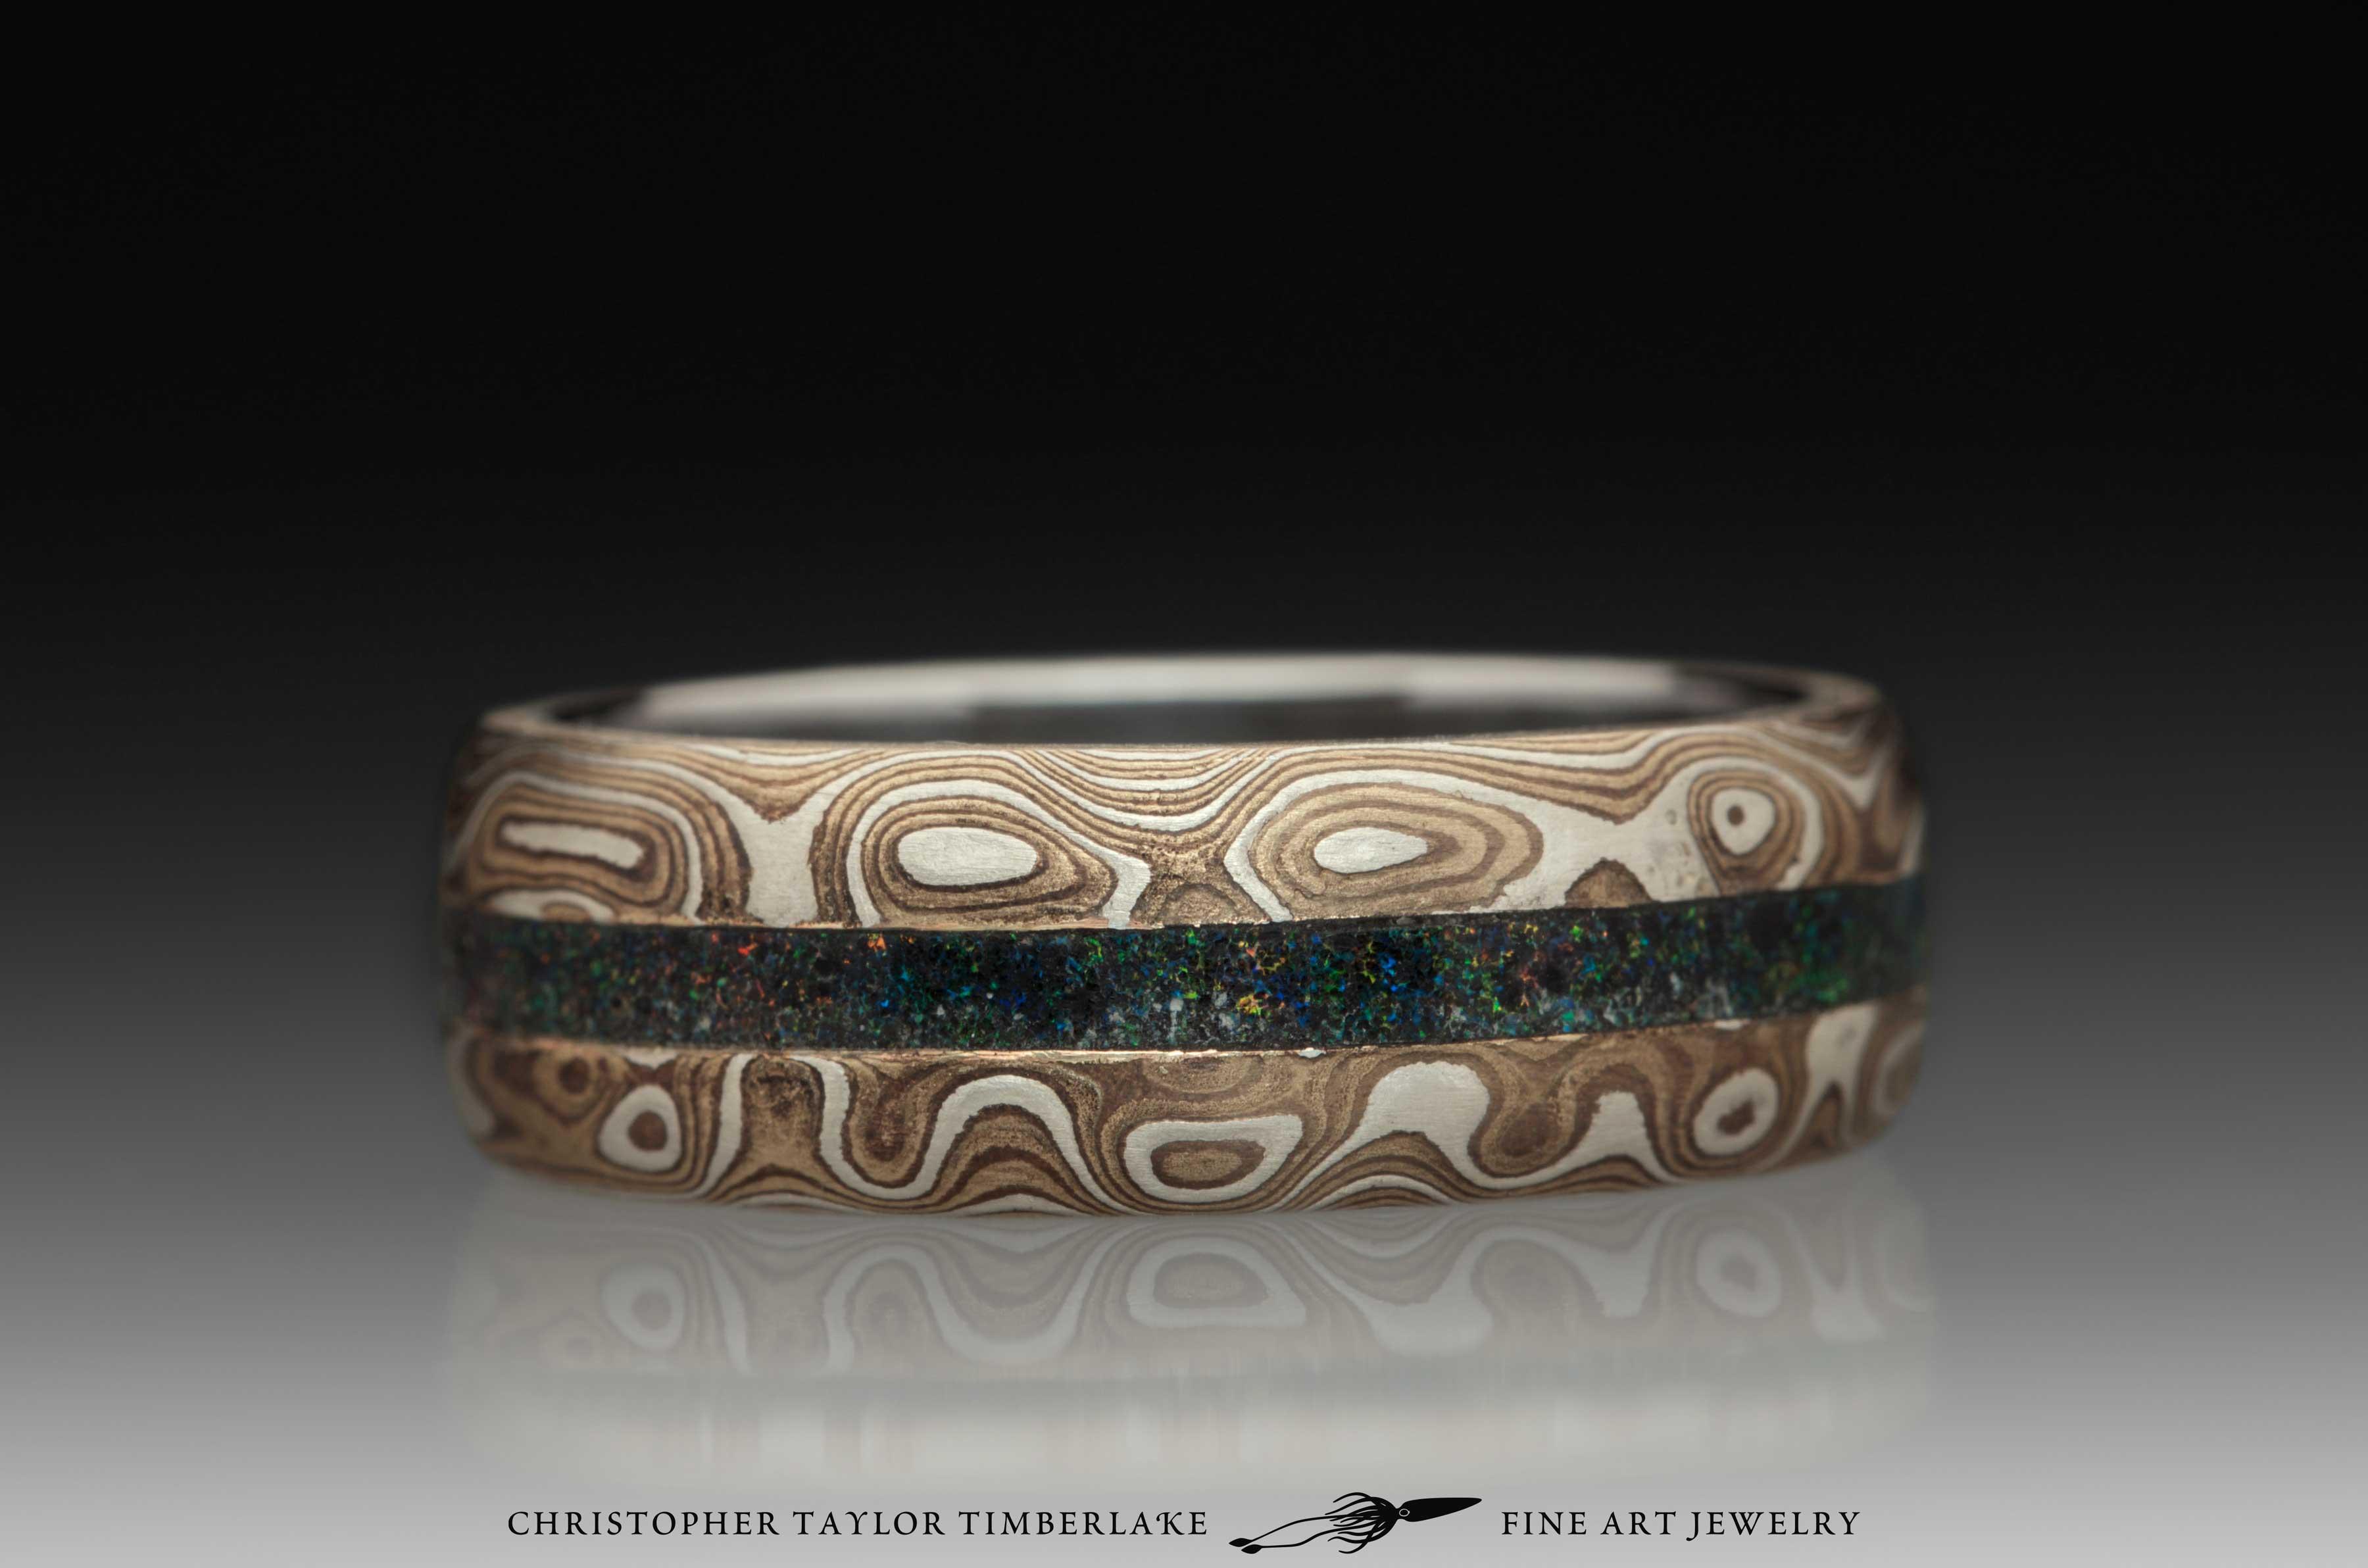 Mokume-Gane-(M104)-Sterling-Silver,-Shakudo-2k,-Kogane-3k,-andamooka-opal-inlay,-burl-wood,-domed,-etched,-stainless-steel-inner-band,-2.75-2-2.75,-7.5mm-2